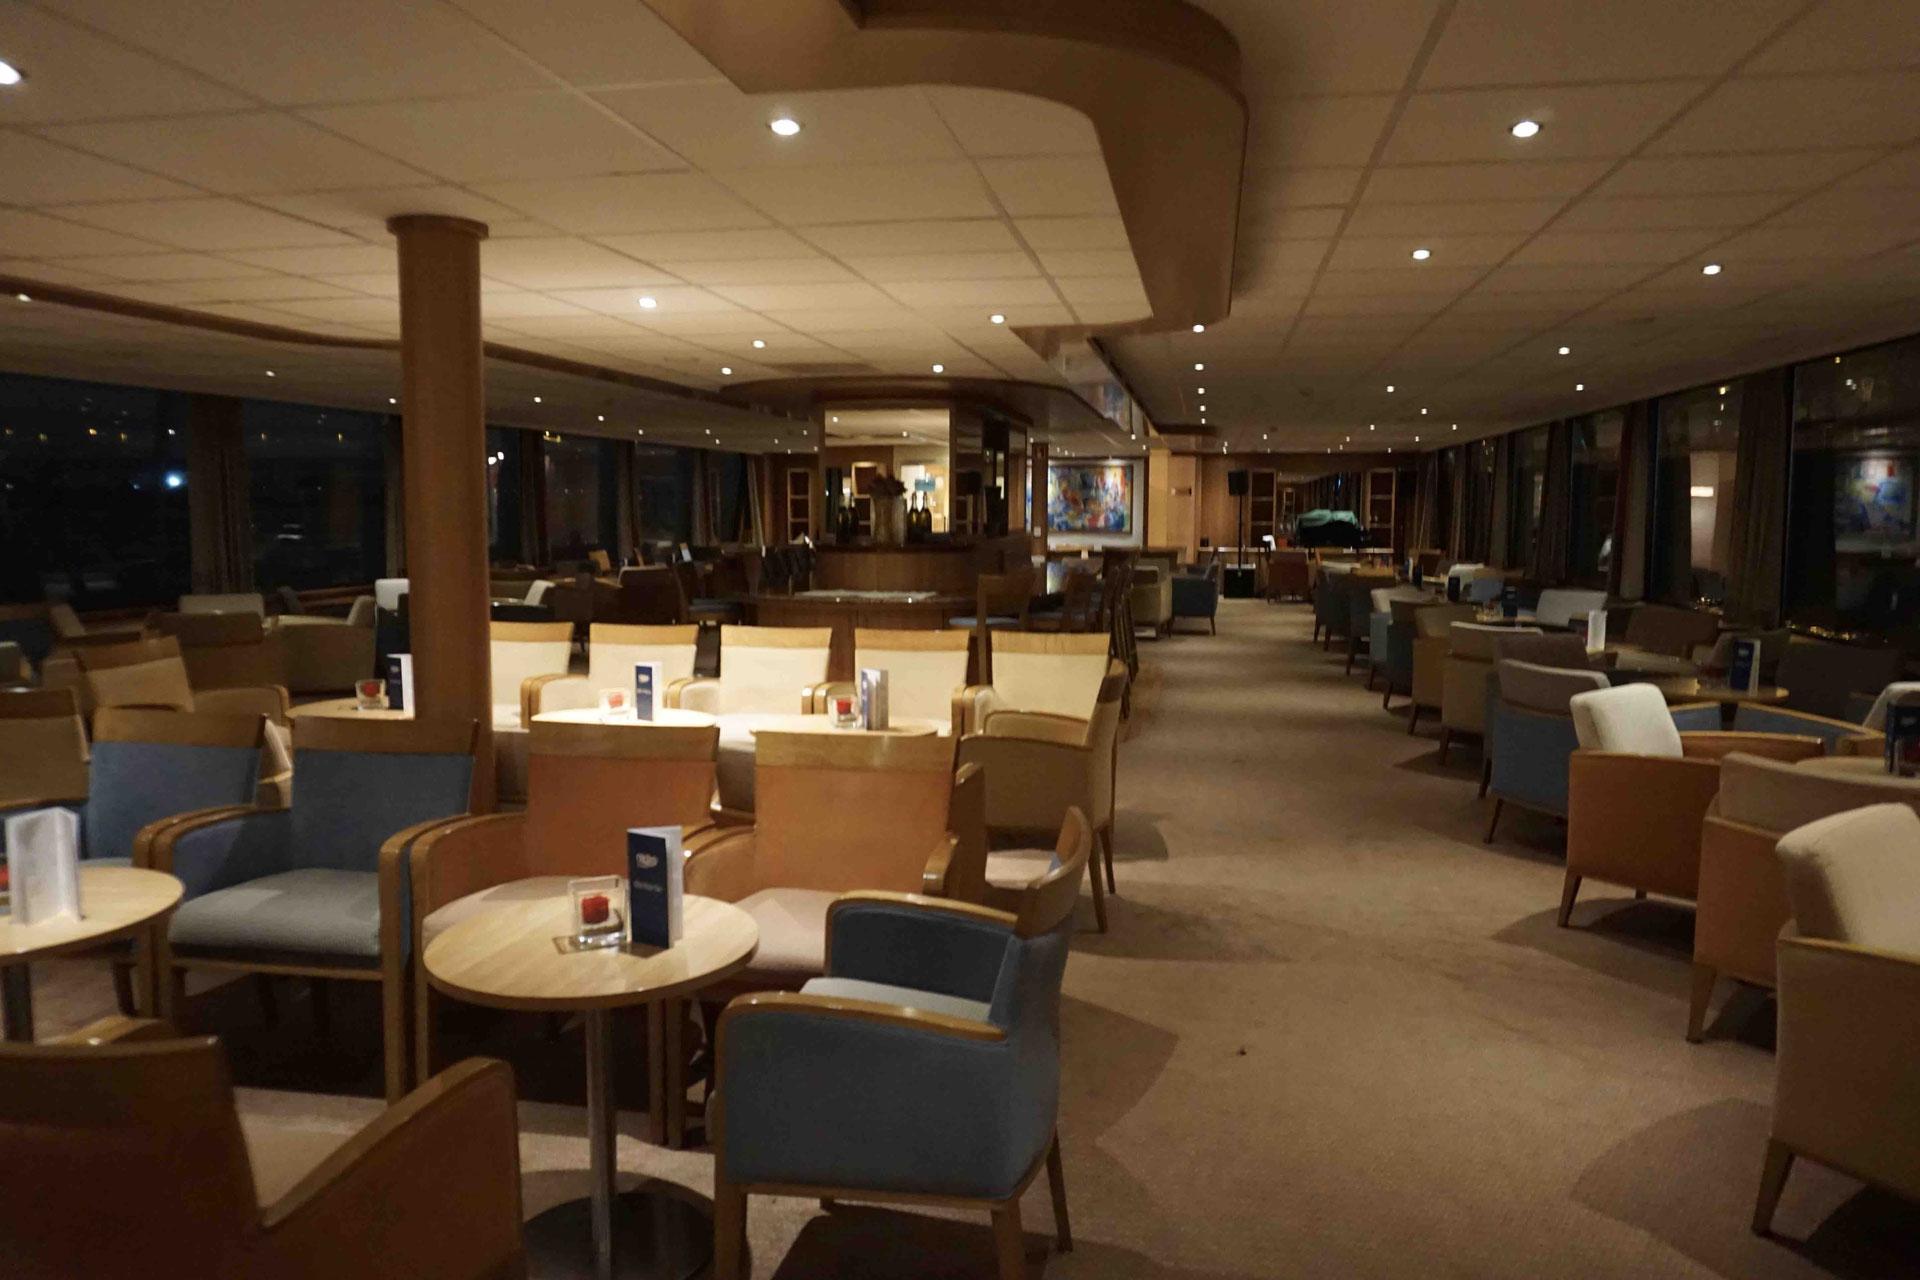 MS Rhein Melodie Panorama Lounge mit Bar